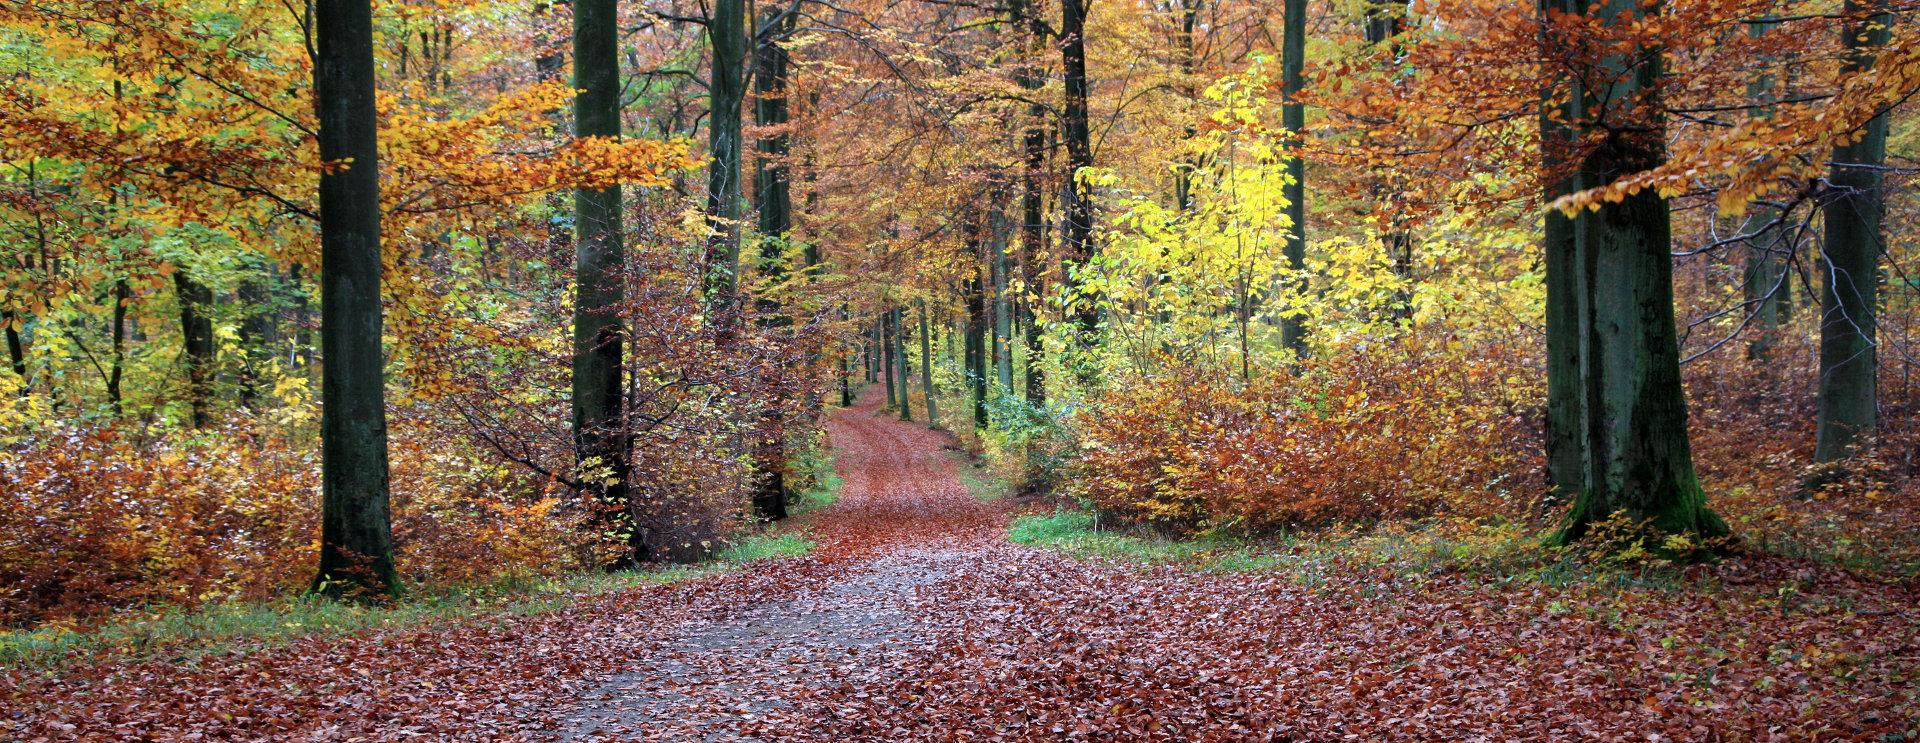 FOREST IN DENMARK © Jean Schweitzer | Dreamstime.com